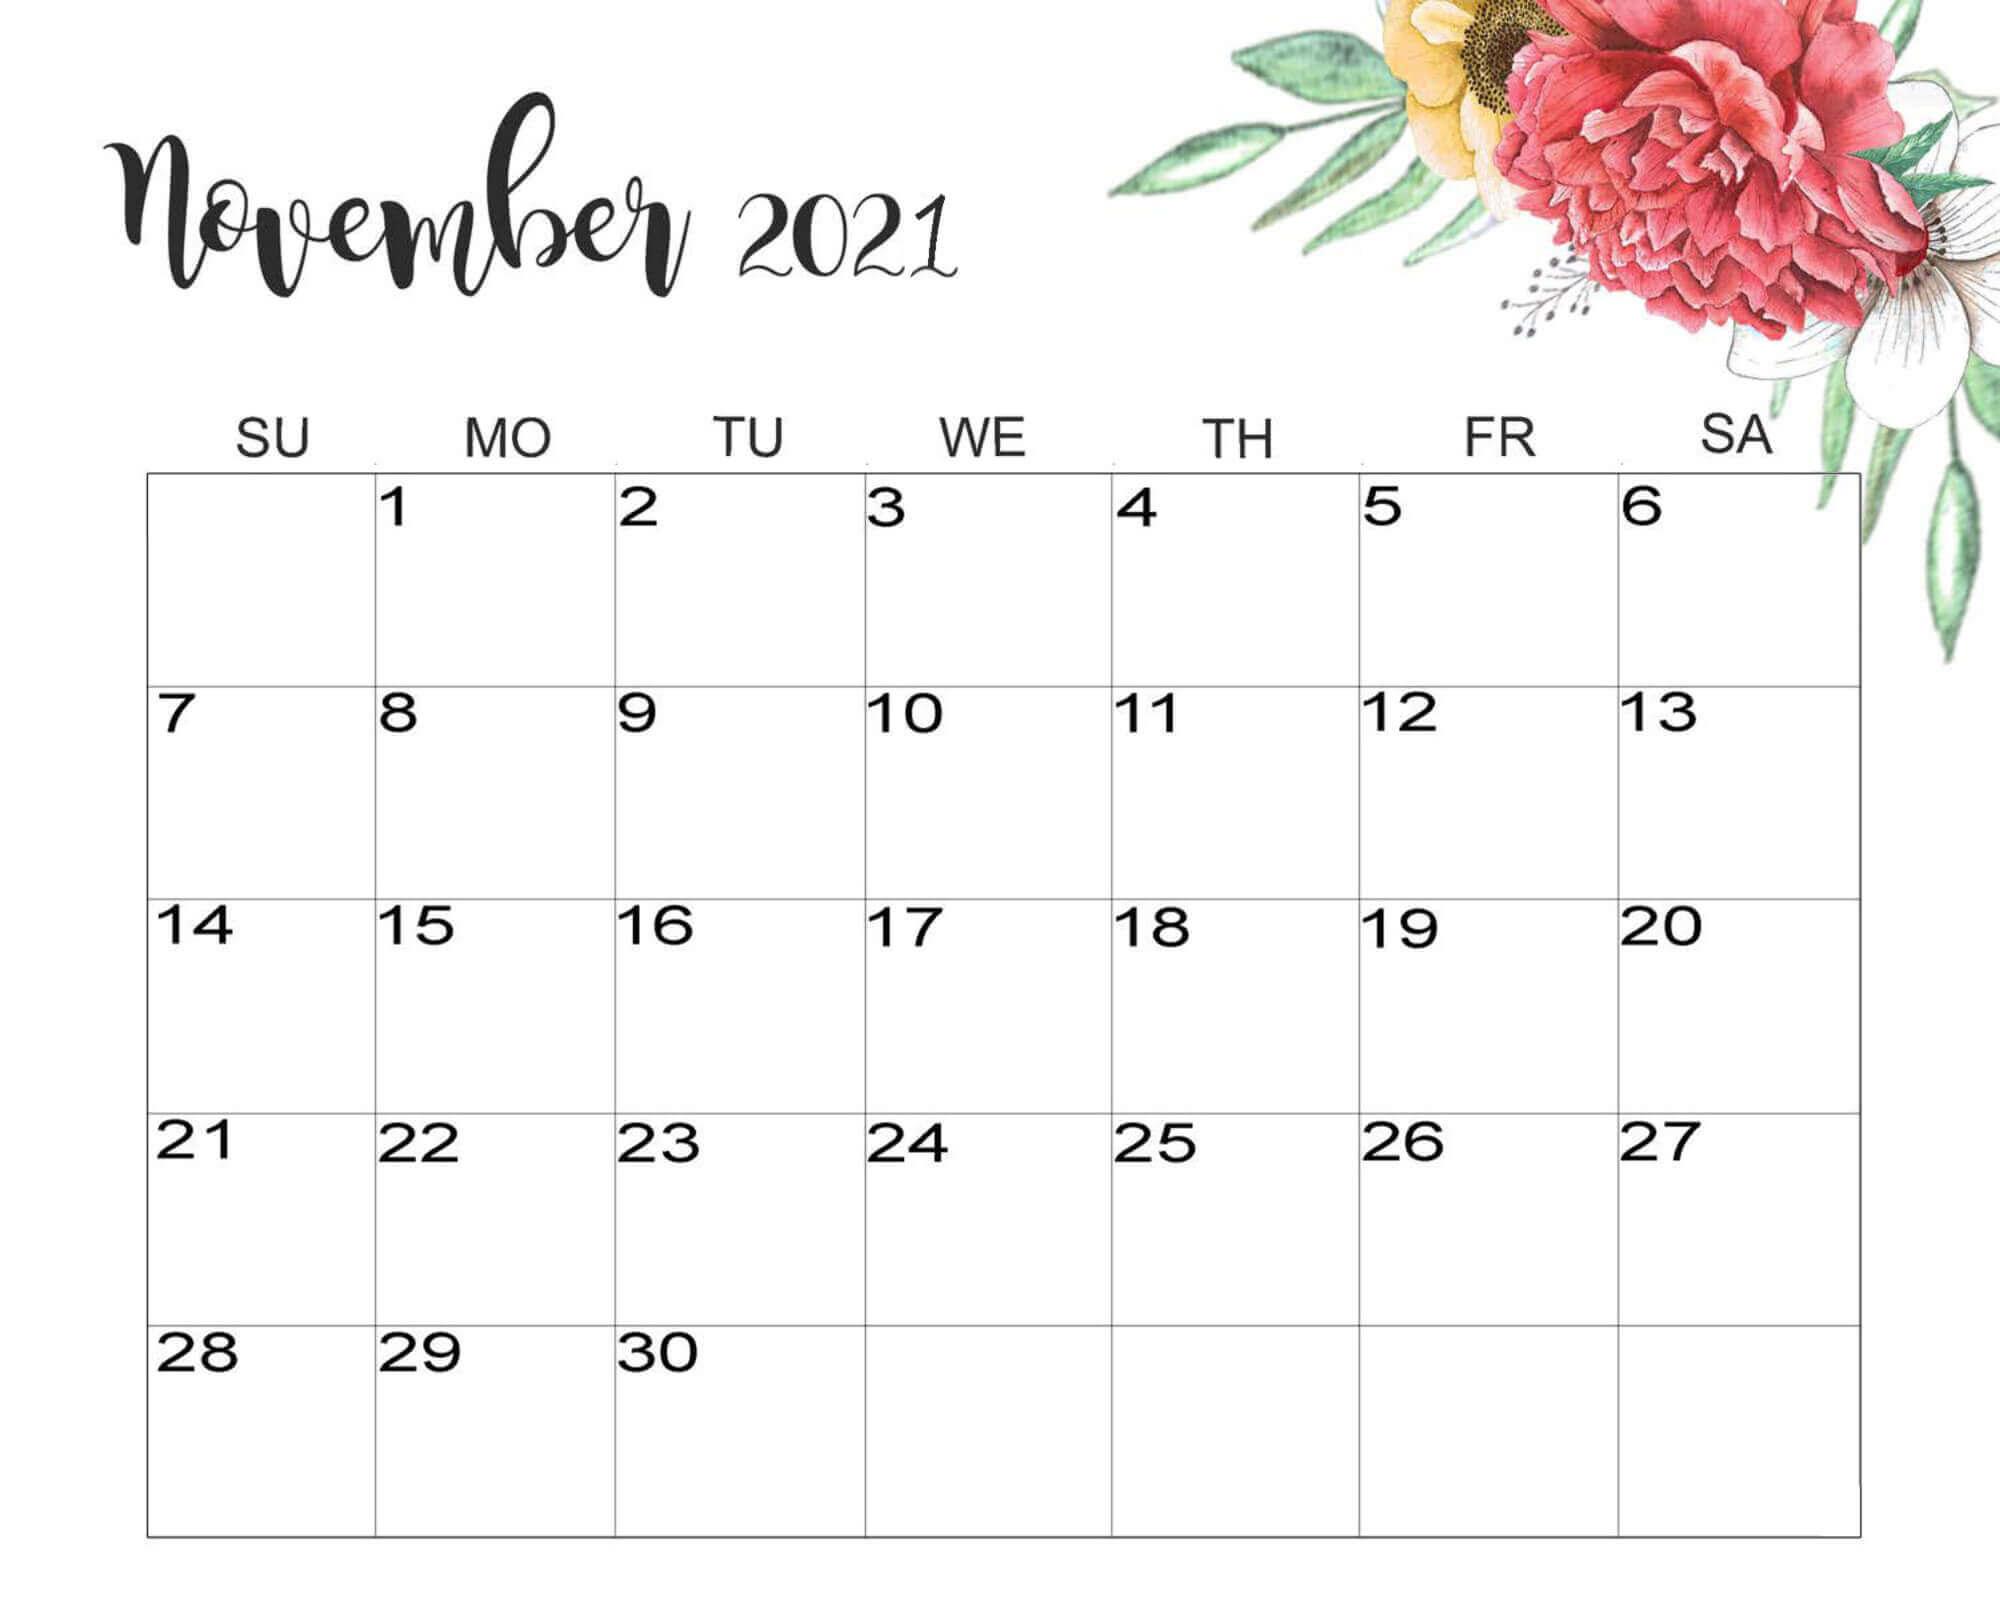 Floral November 2021 Calendar Cute